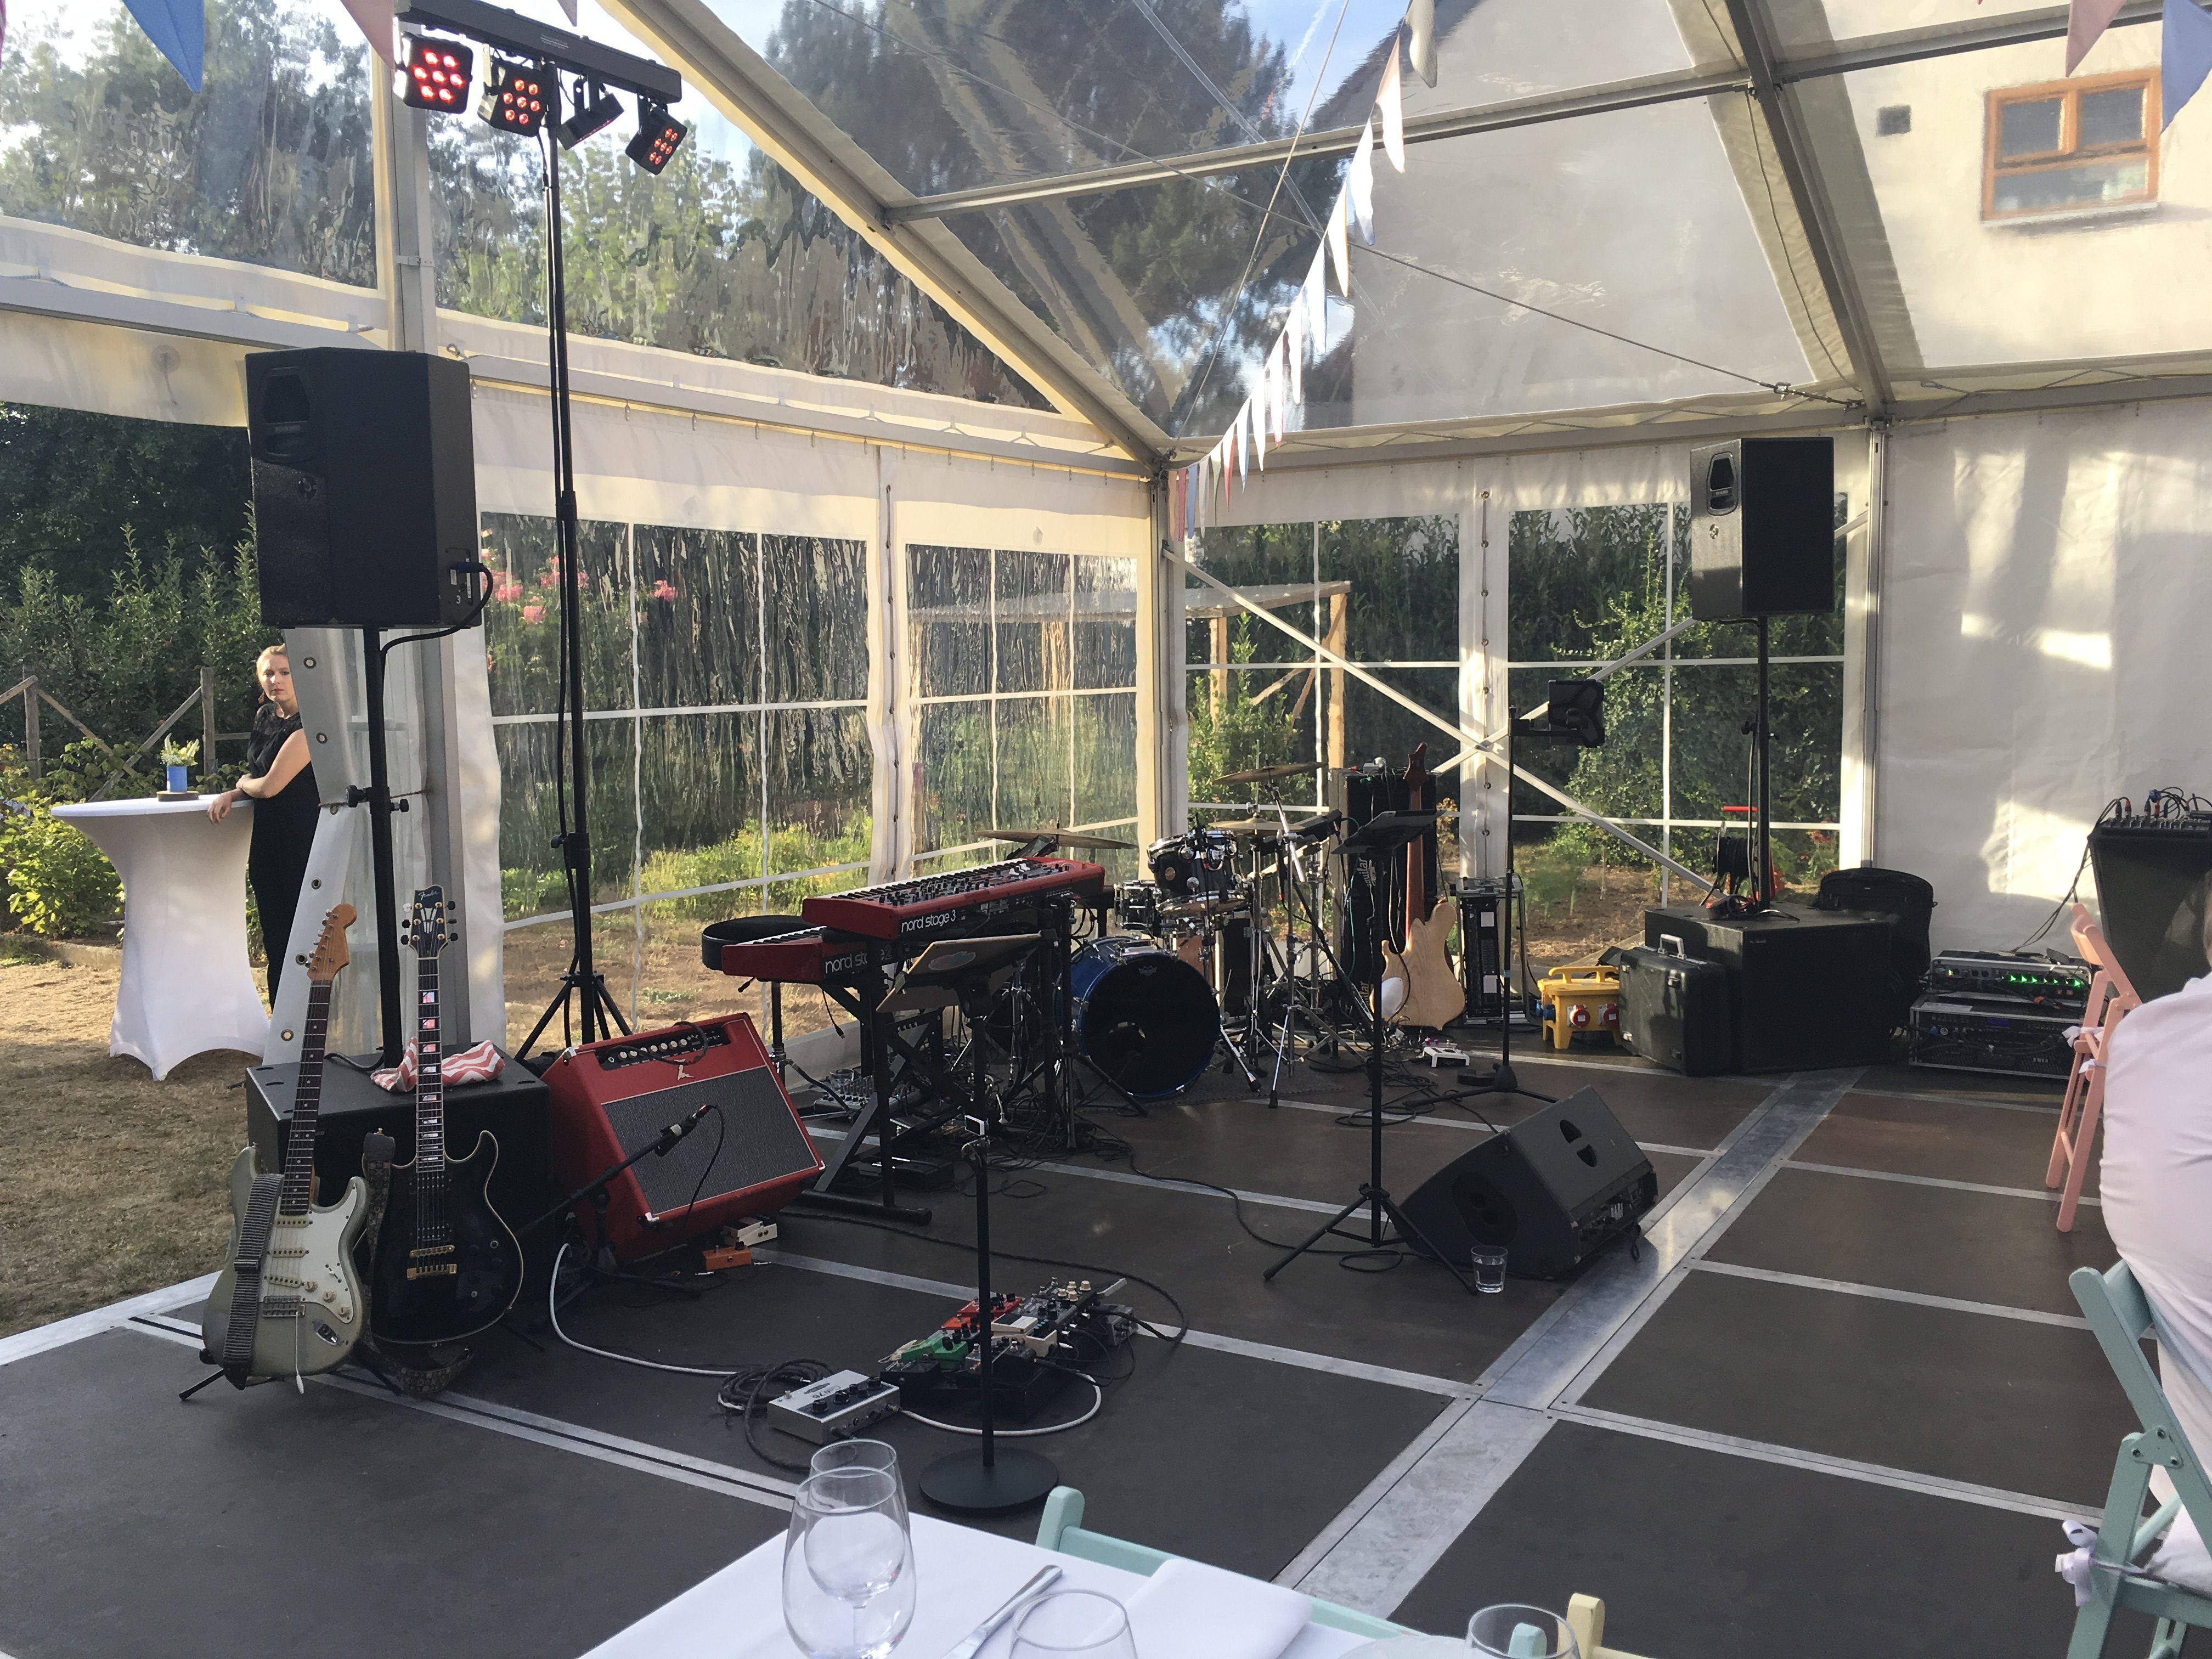 Partyband Schlagerband Showband Tanzband Schutzenfestband